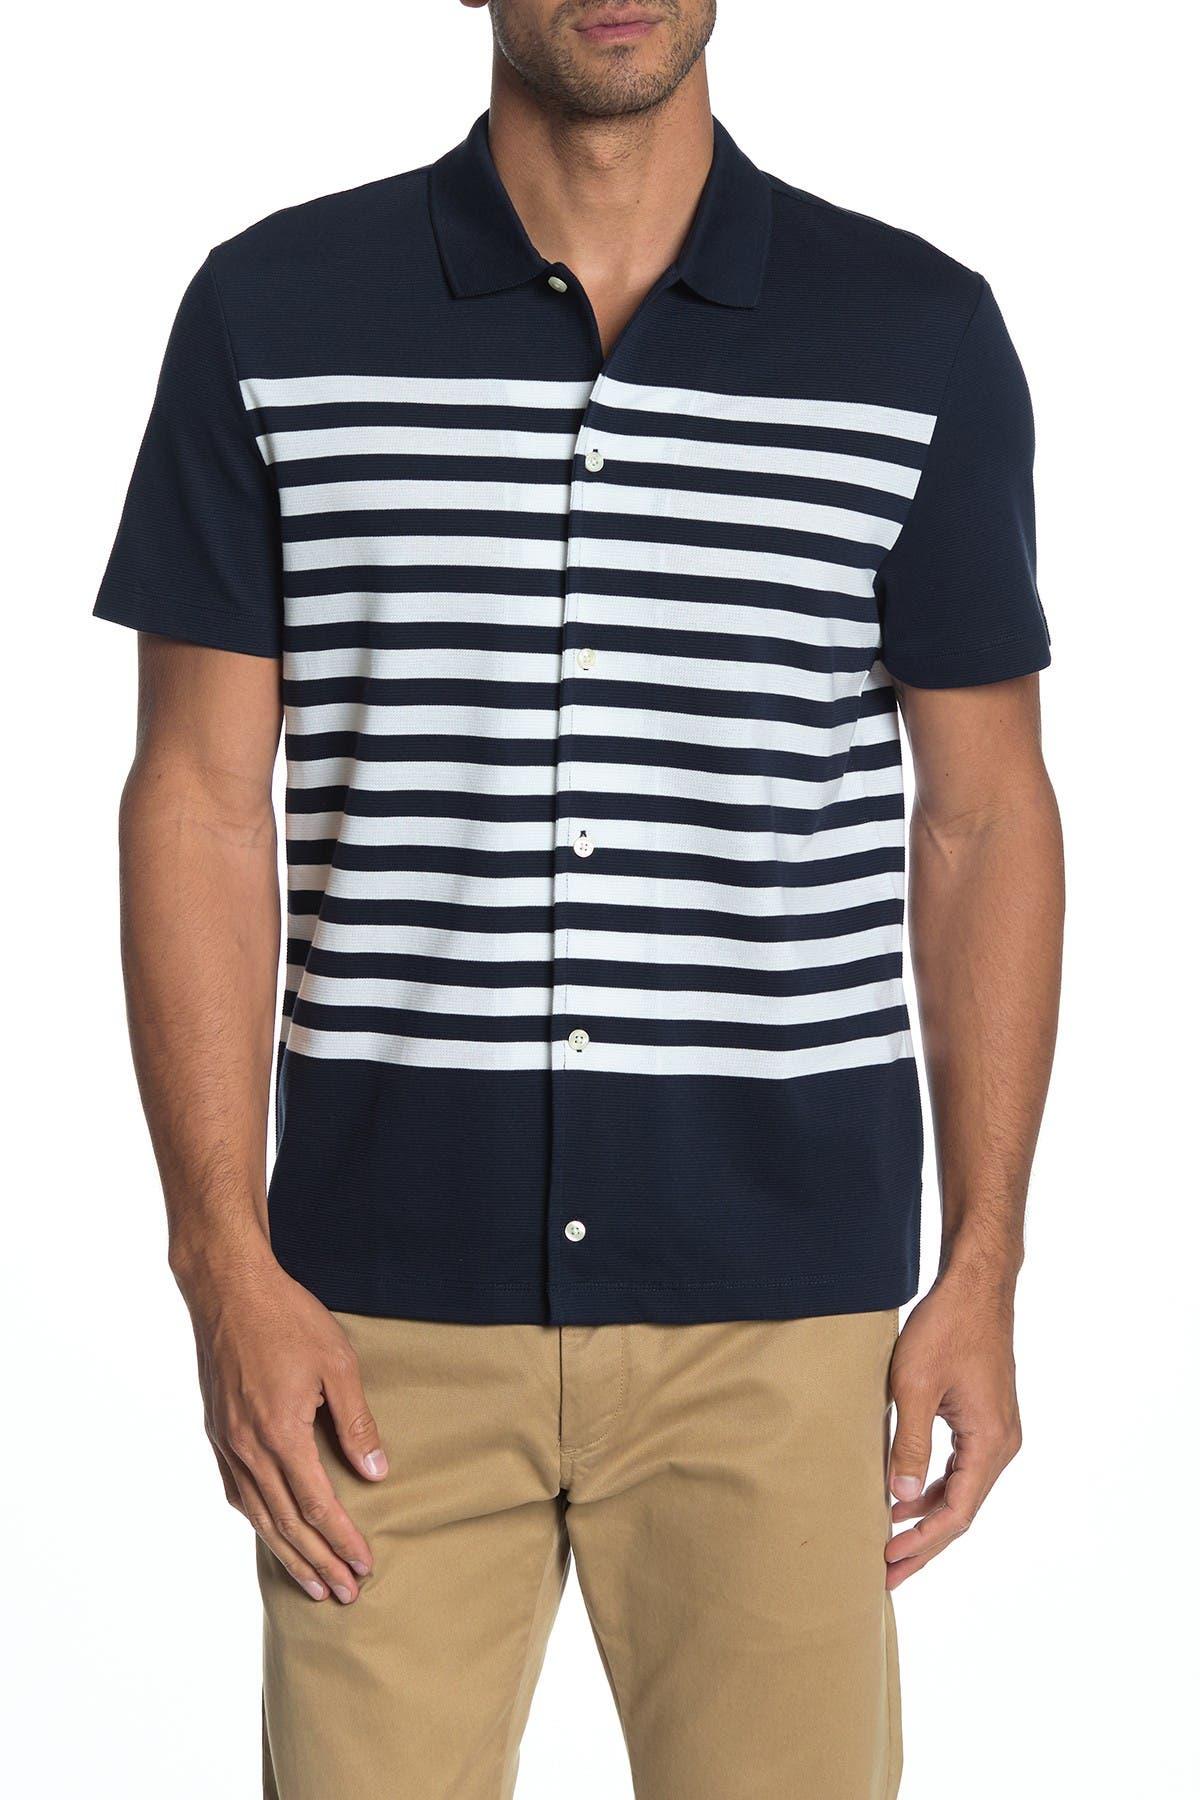 Image of Michael Kors Striped Short Sleeve Pique Shirt